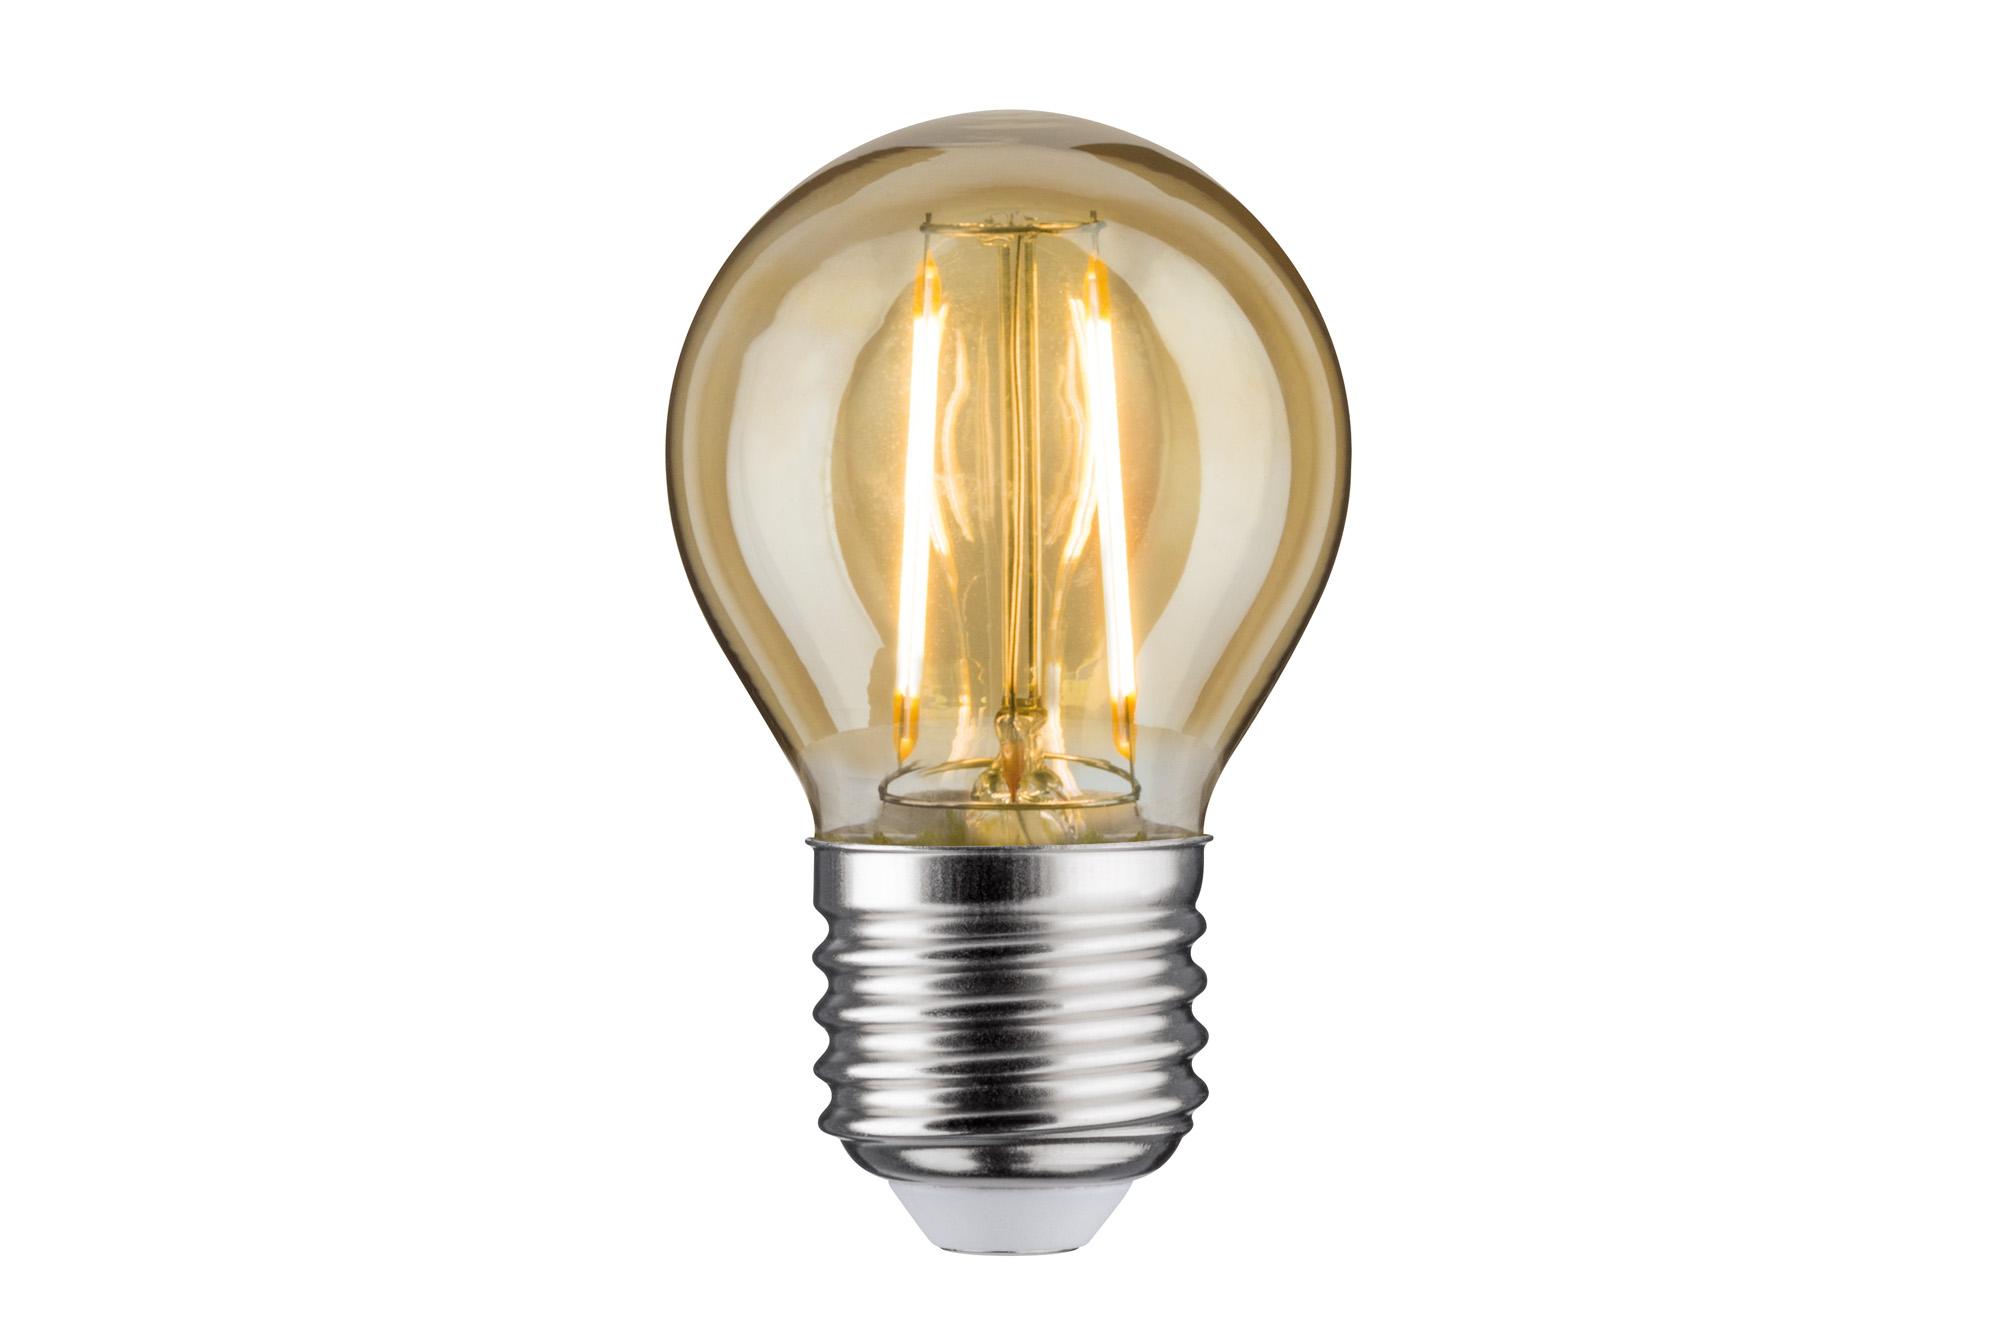 PAULMANN P 28479 led žárovka 4,5W 5W > 80 Ra